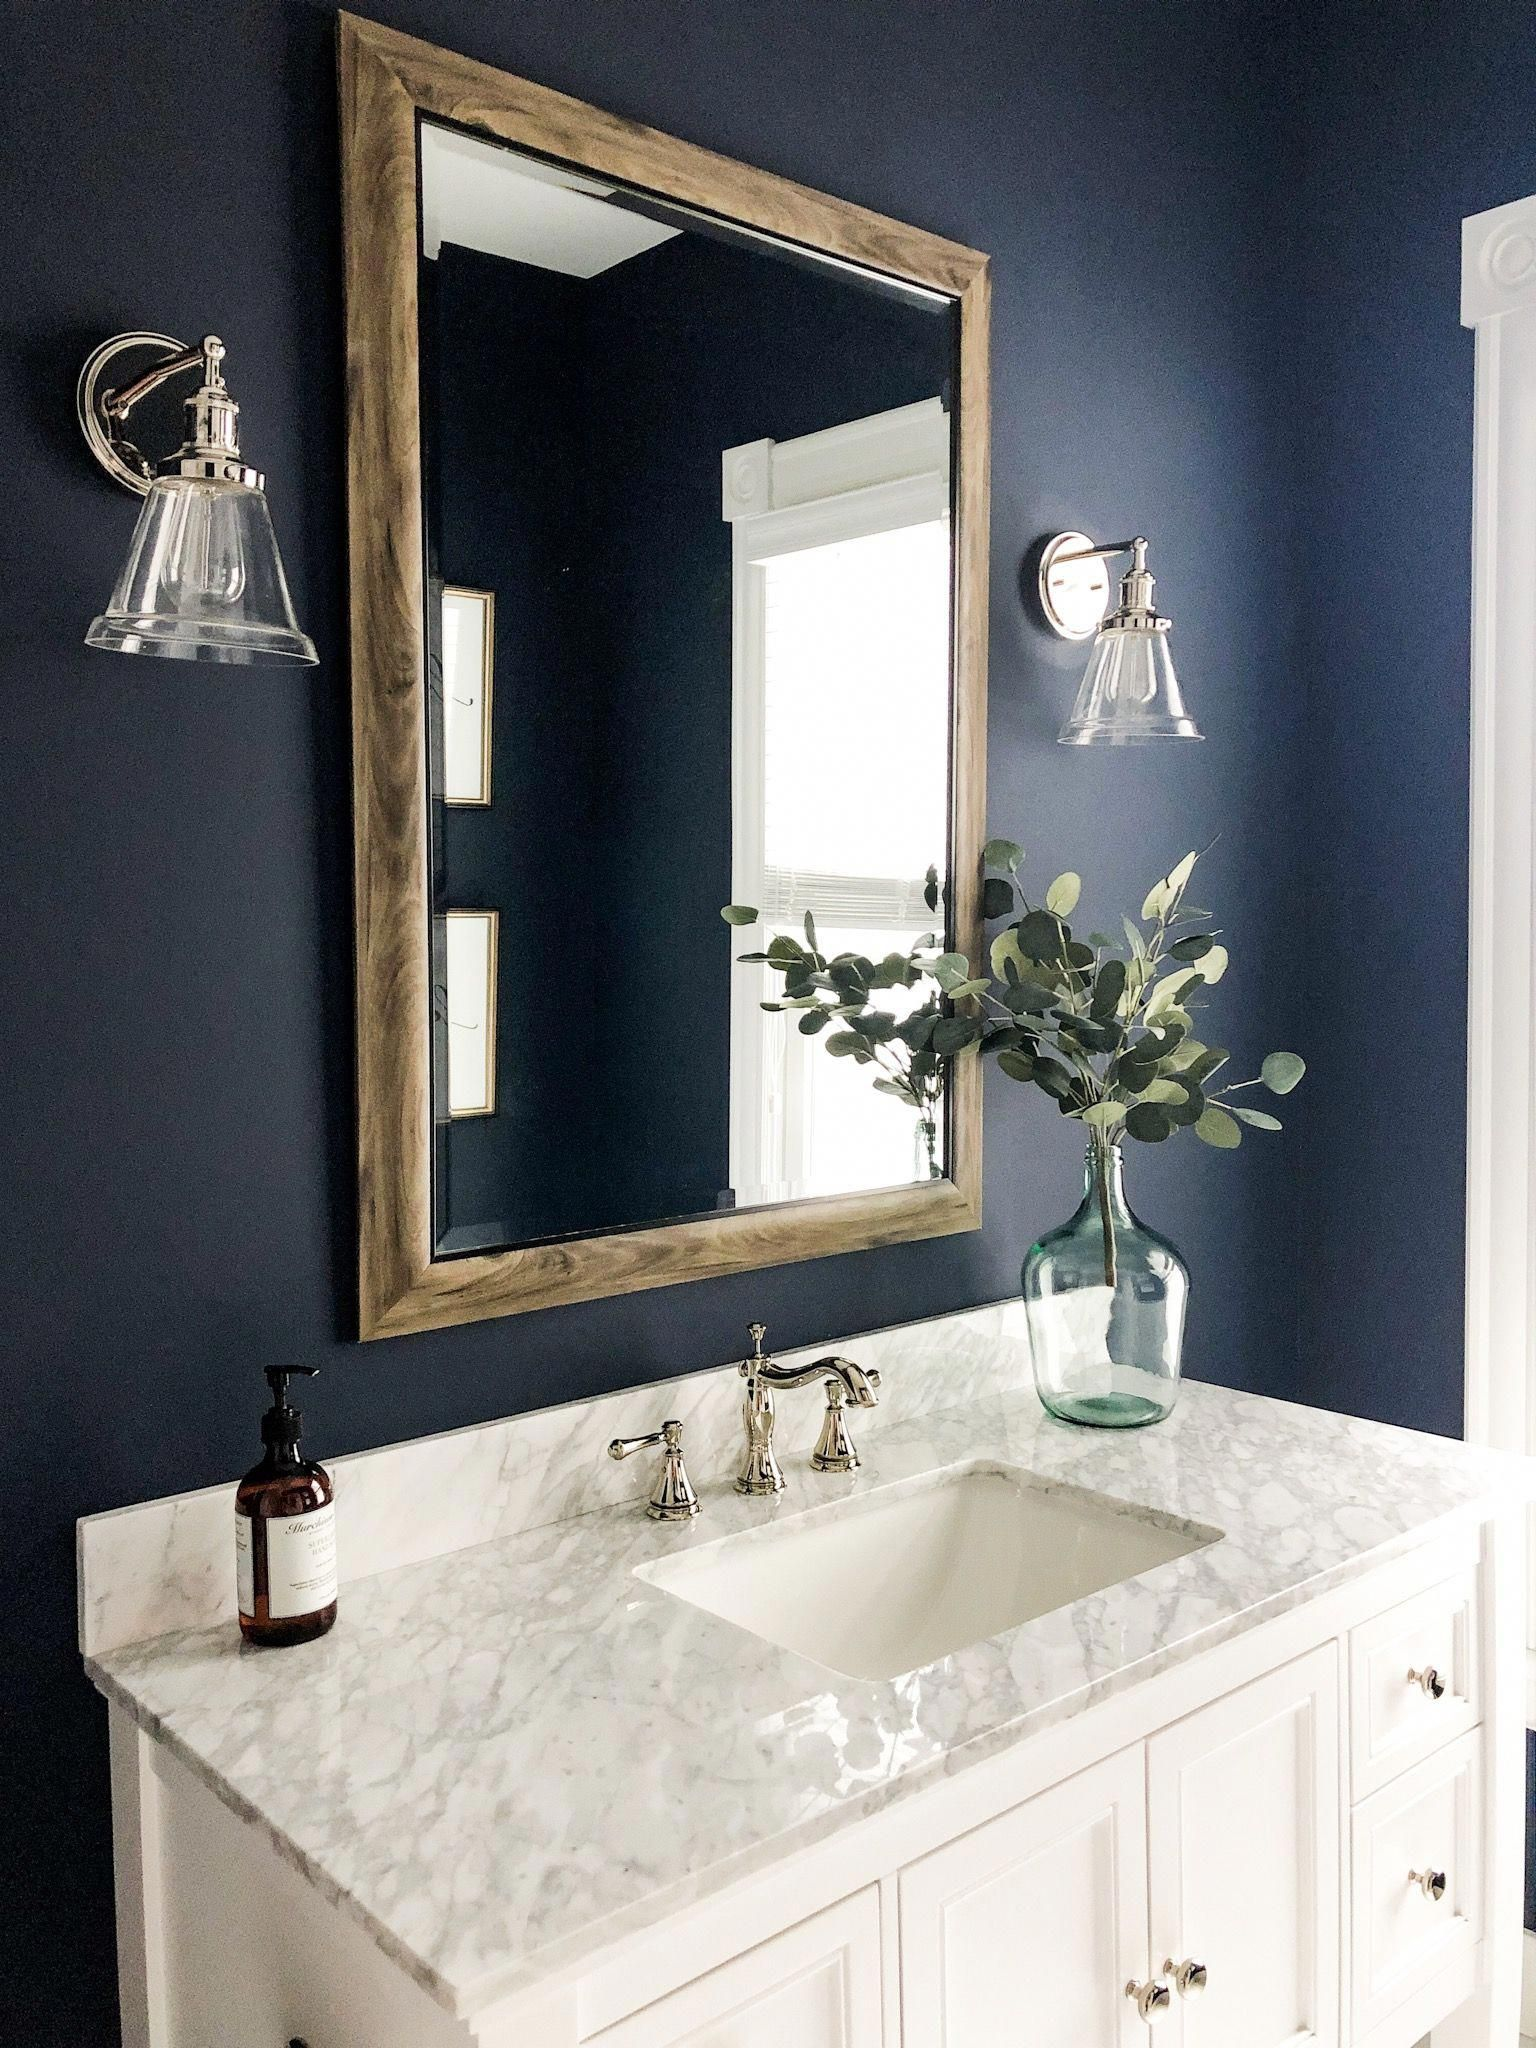 Deep Blue Bathroom Paint Color Powder Room Decor Bonus Bathroom Inspiration Half Bath Inspi Bathroom Paint Colors Blue Powder Room Decor Blue Bathroom Paint